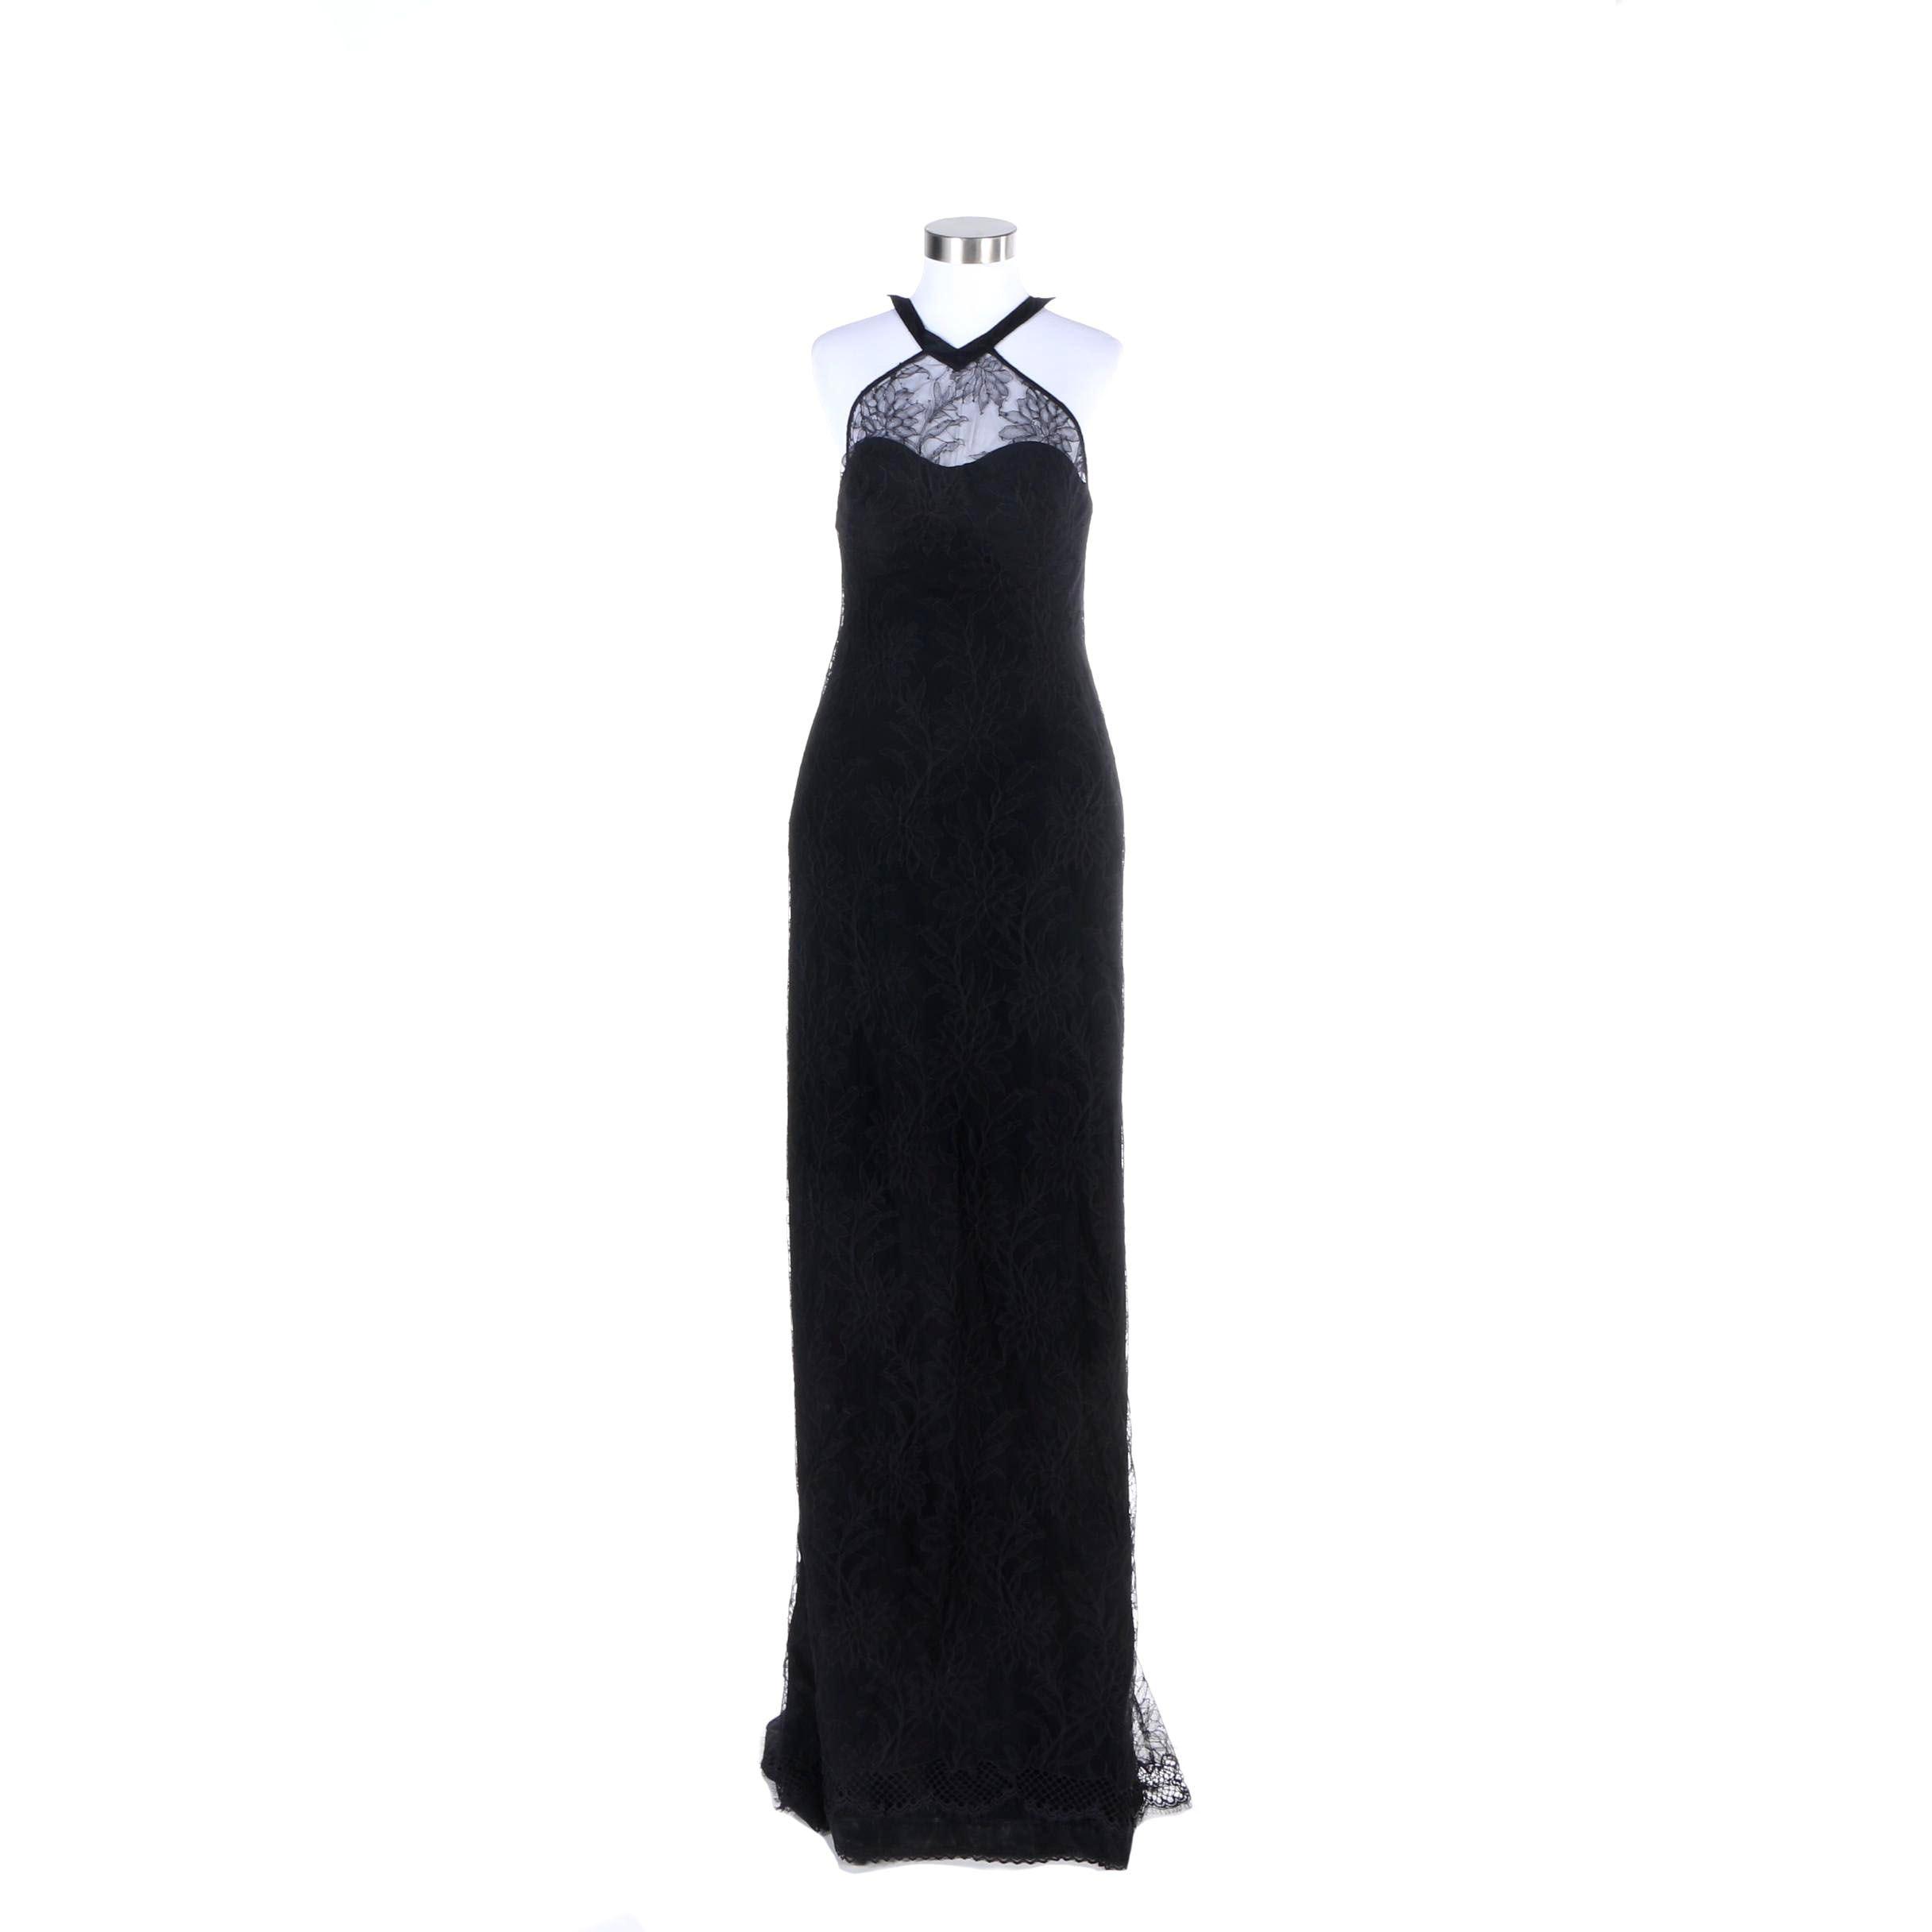 L'Wren Scott Serengeti Sunset Lace Dress